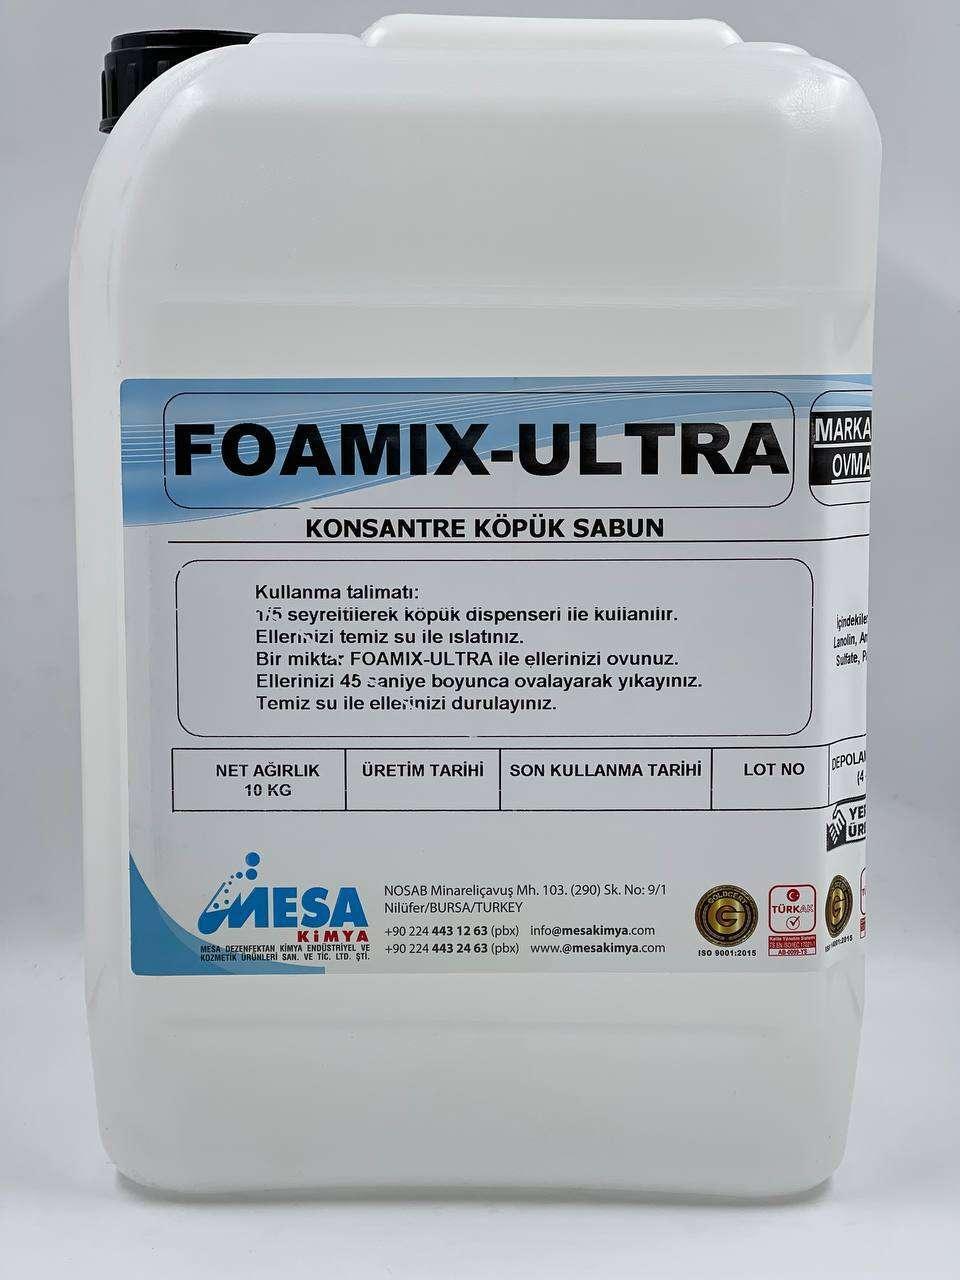 Foamix ultra konsantre köpük sabun